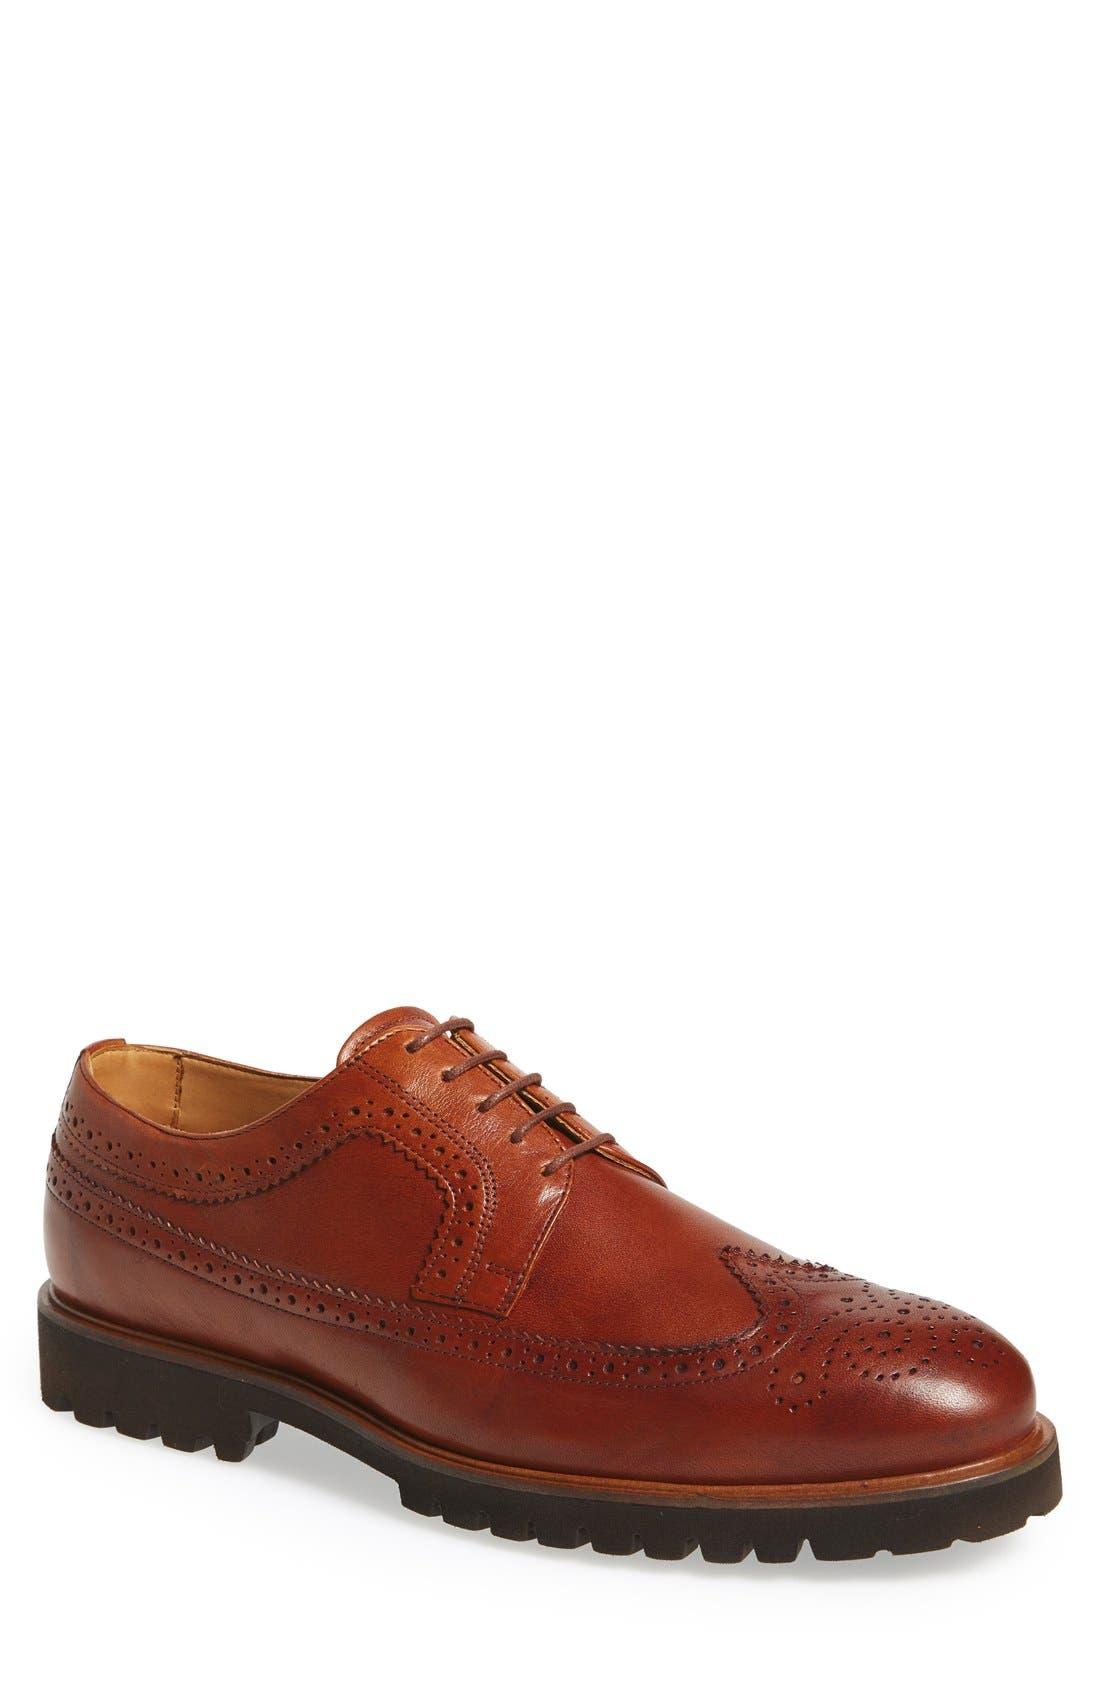 'Loven' Wingtip Derby,                         Main,                         color, Cognac Leather